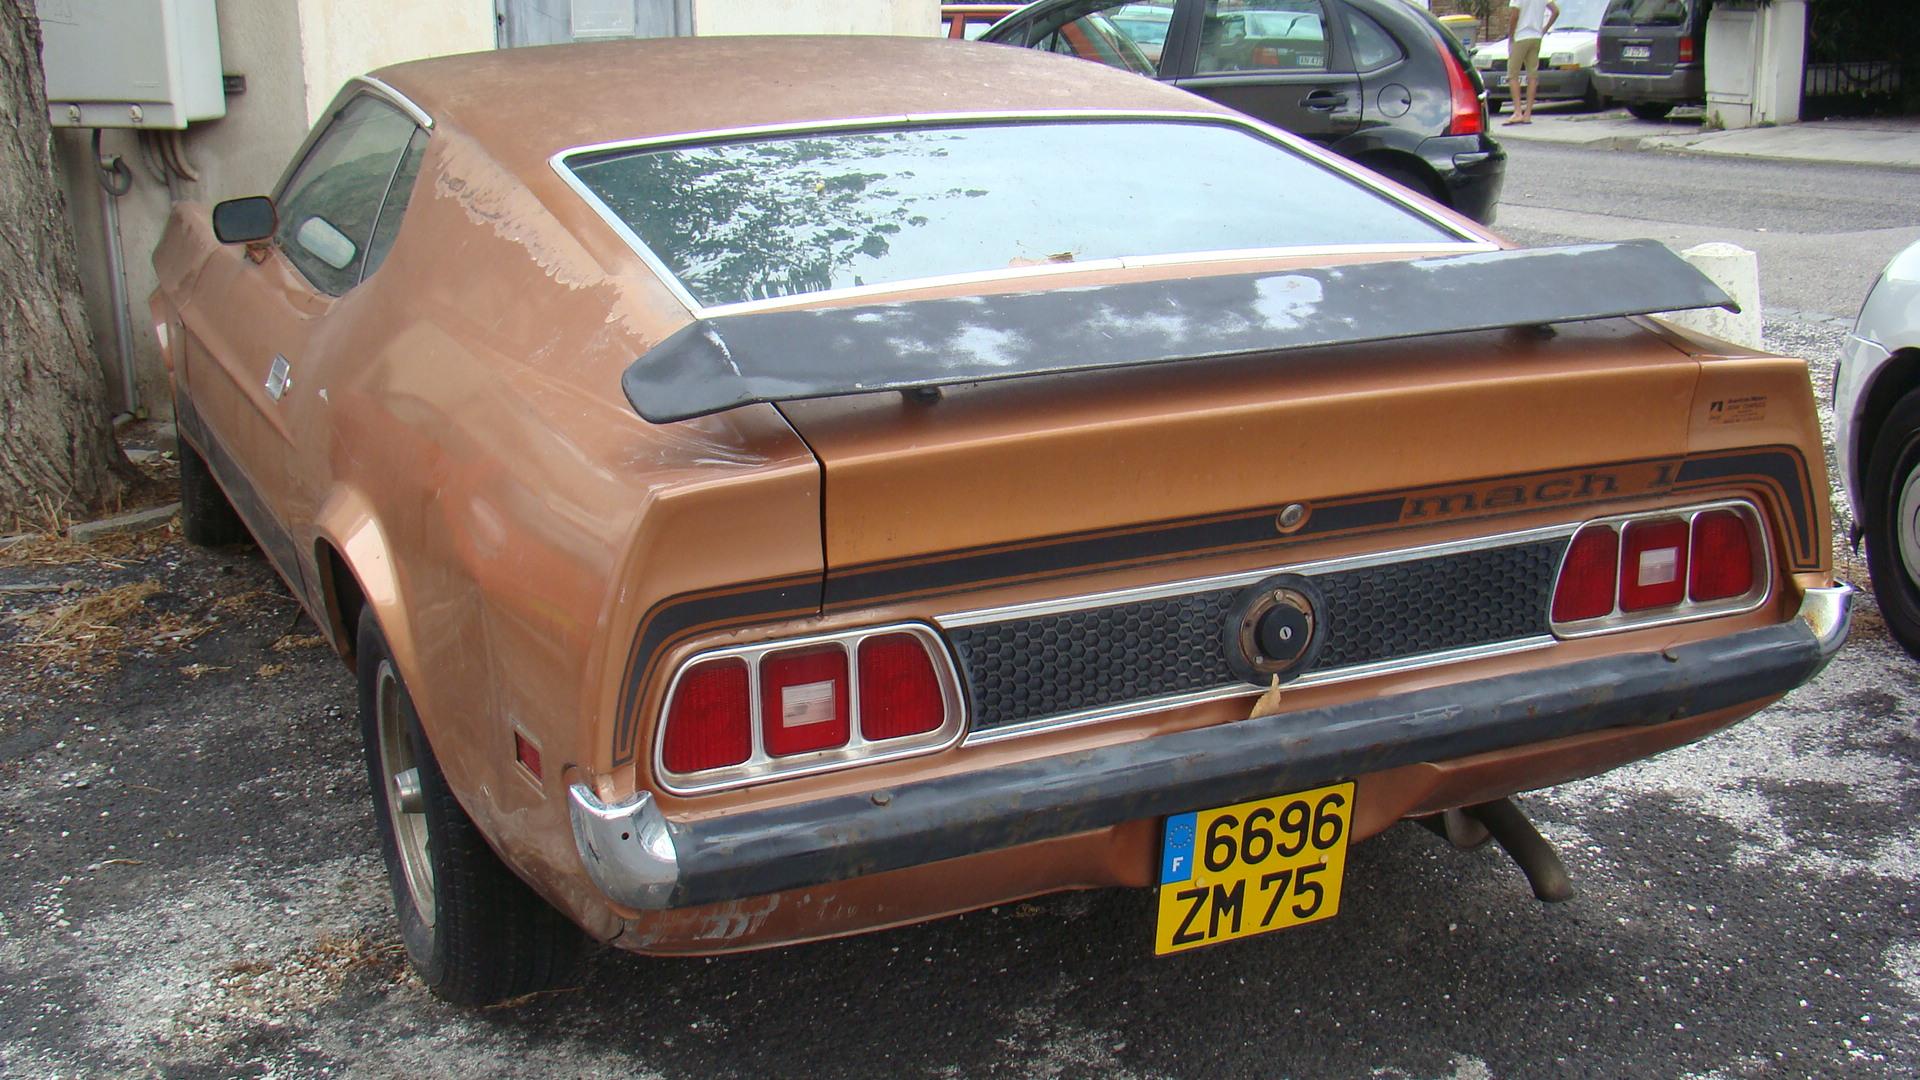 1973 Ford Mustang Mach 1 rear pre restoration France